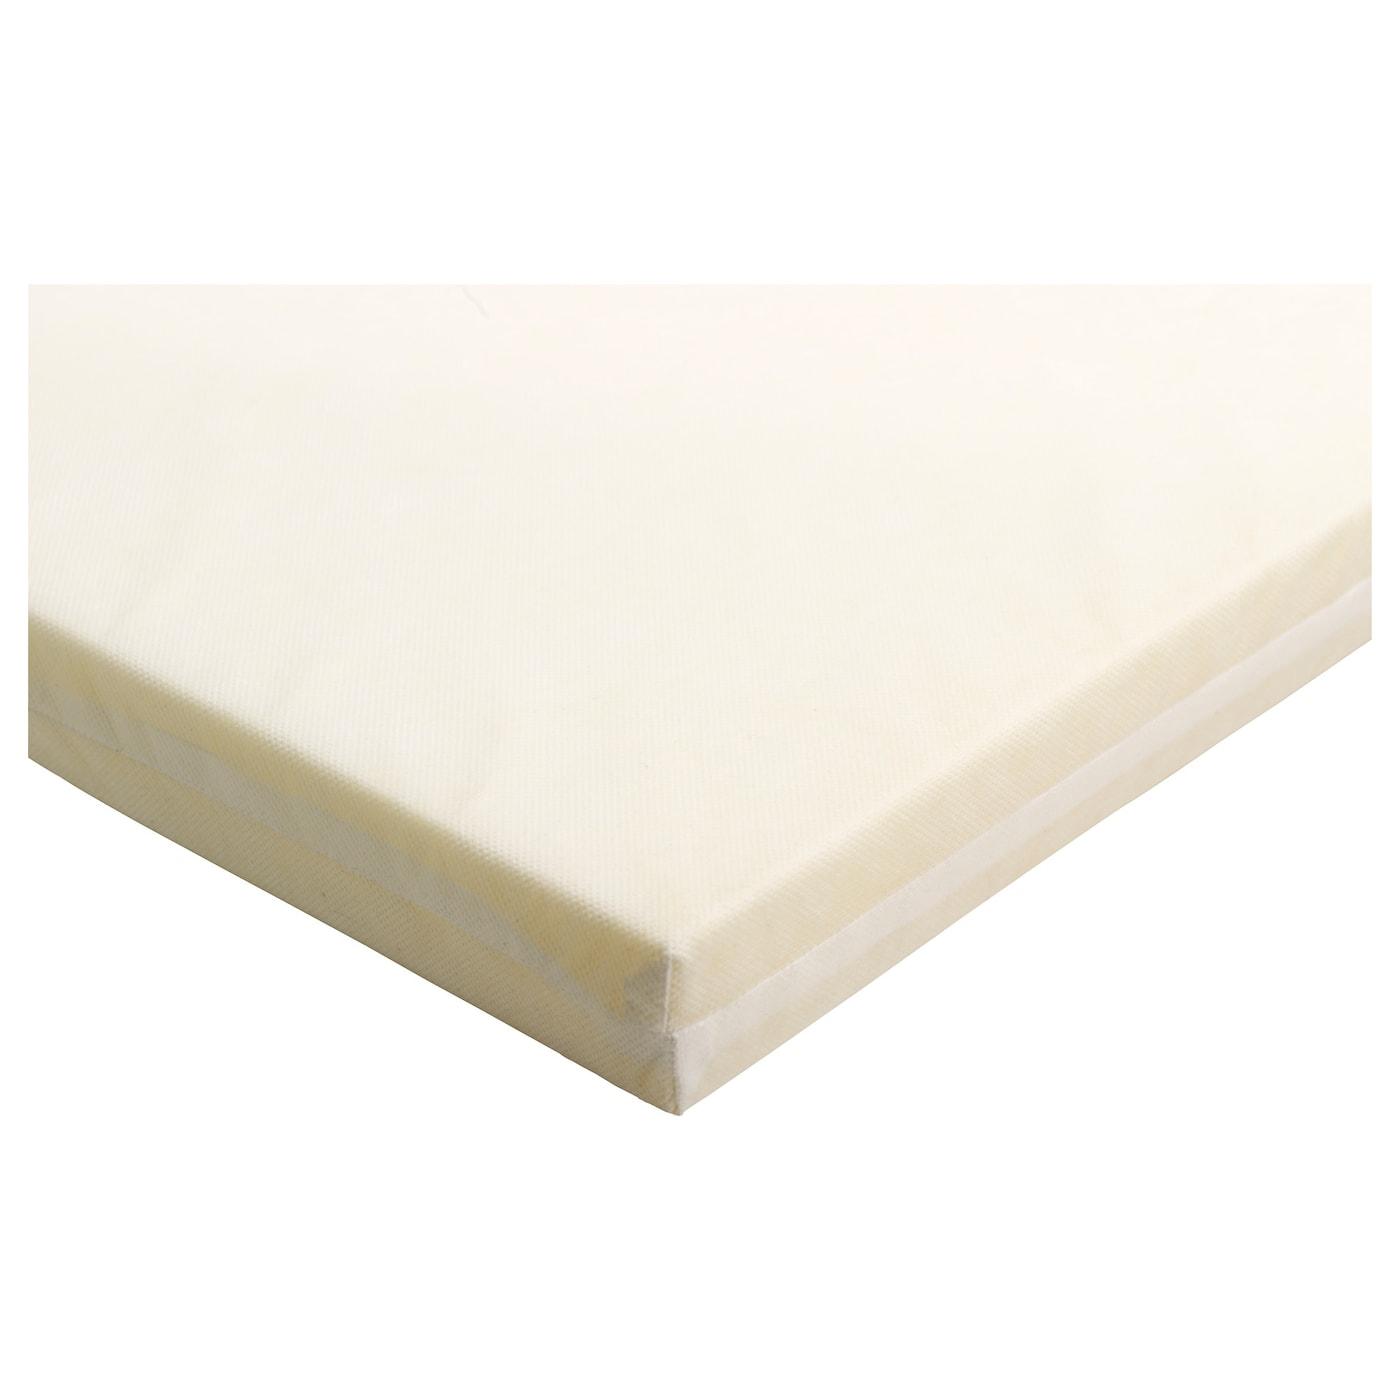 vyssa slappna mattress for junior bed white 70x160 cm ikea. Black Bedroom Furniture Sets. Home Design Ideas